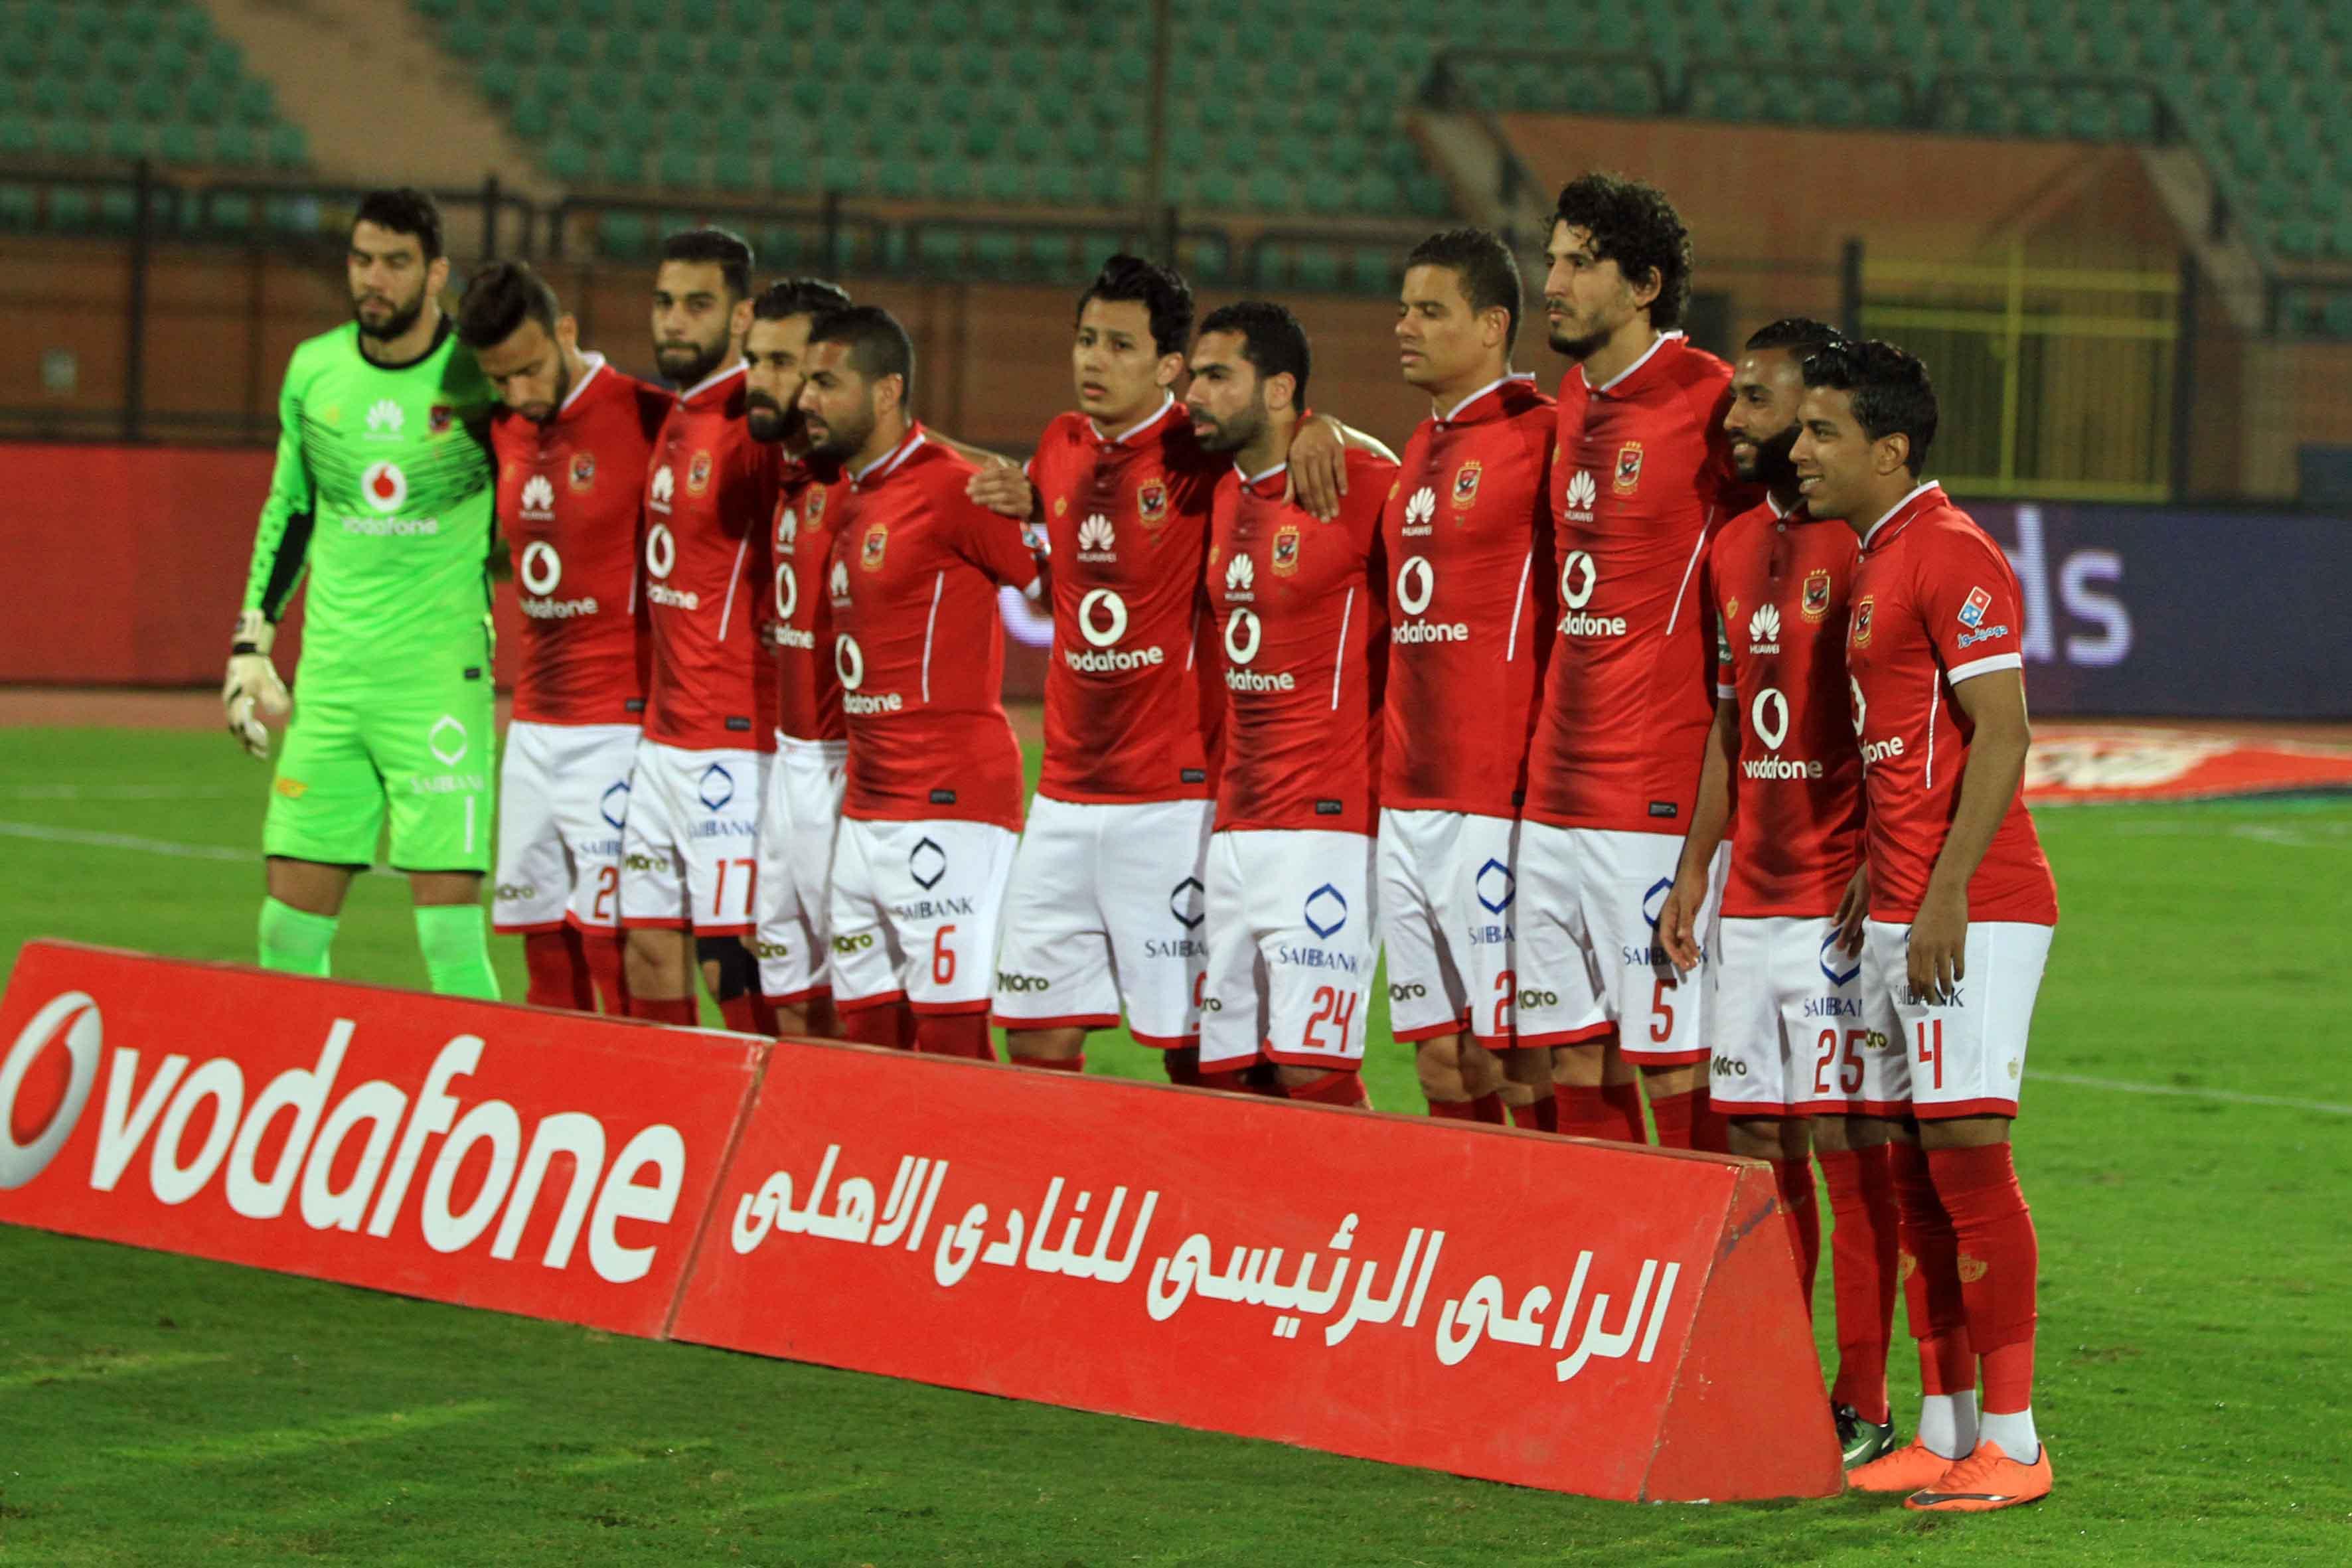 Al Ahly 1-4-2017